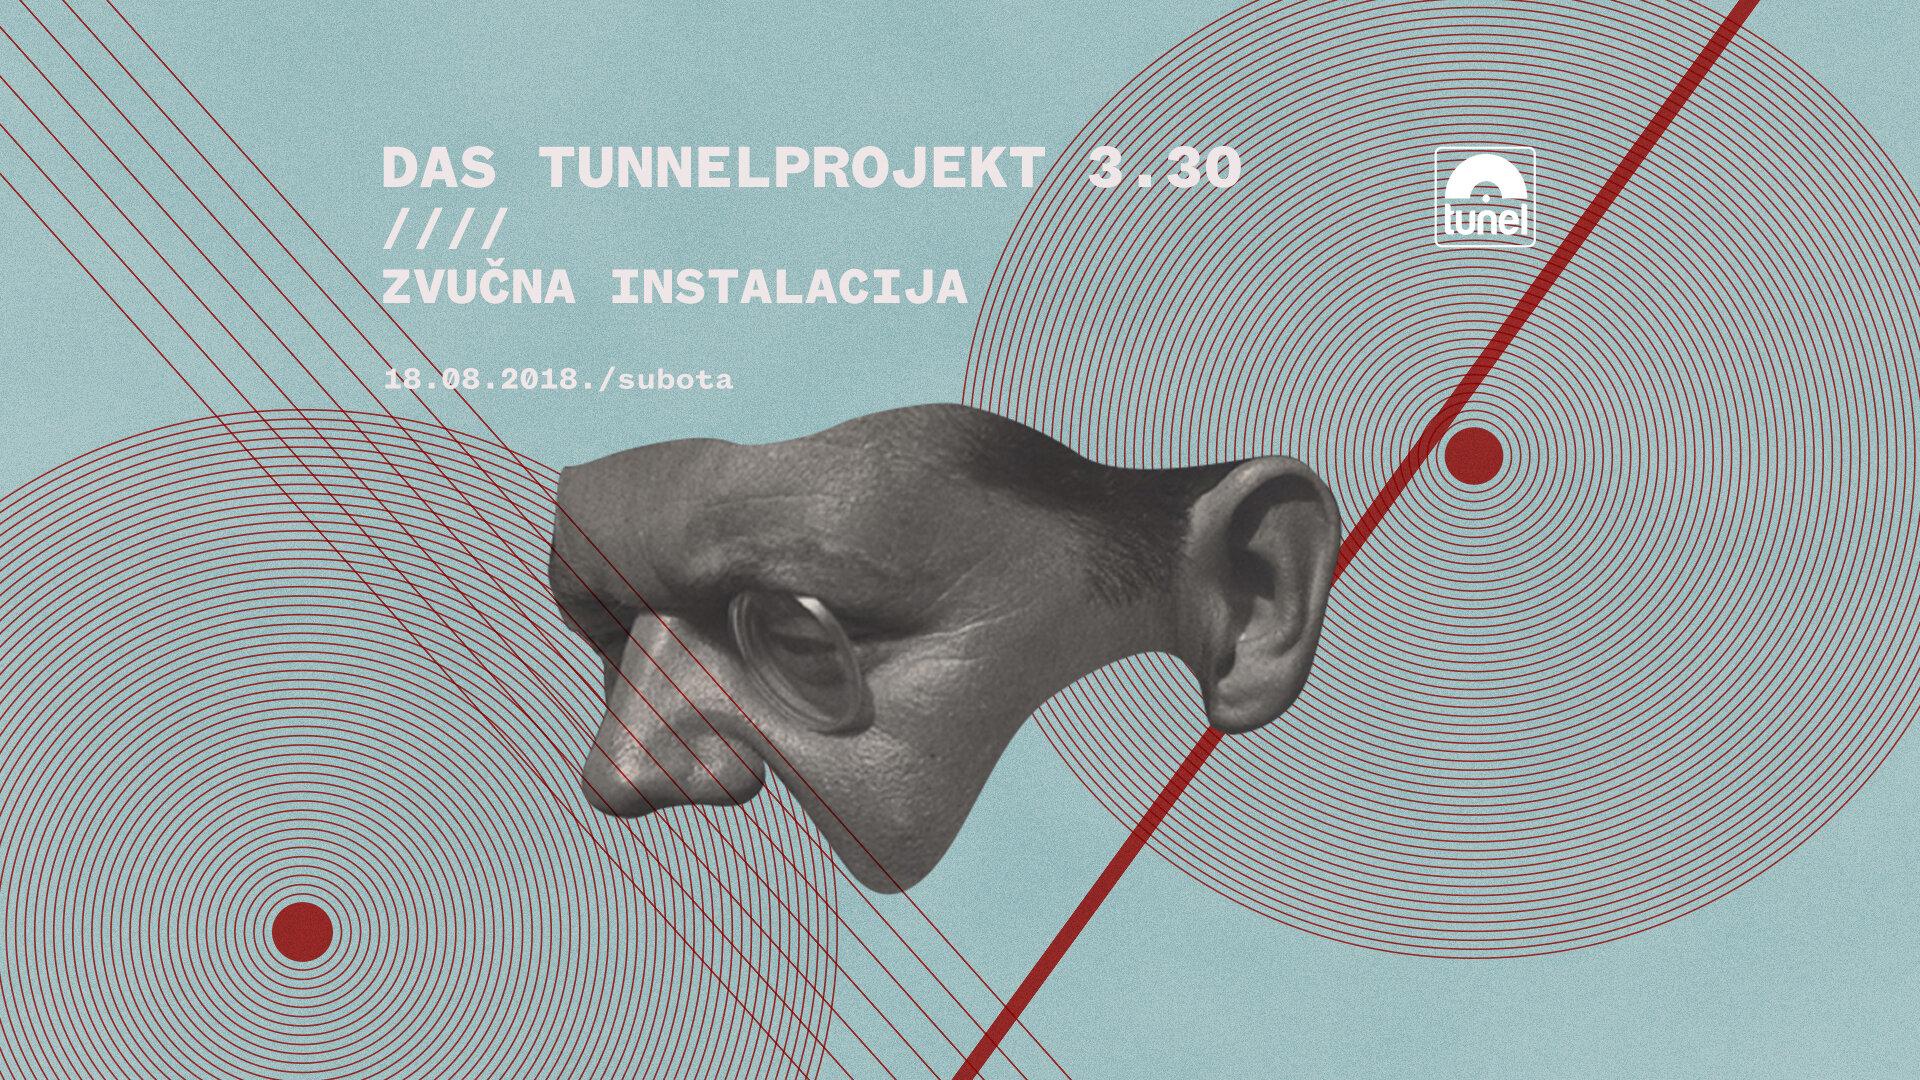 Das-tunnelprojekt-zvucna-instalacija.jpg